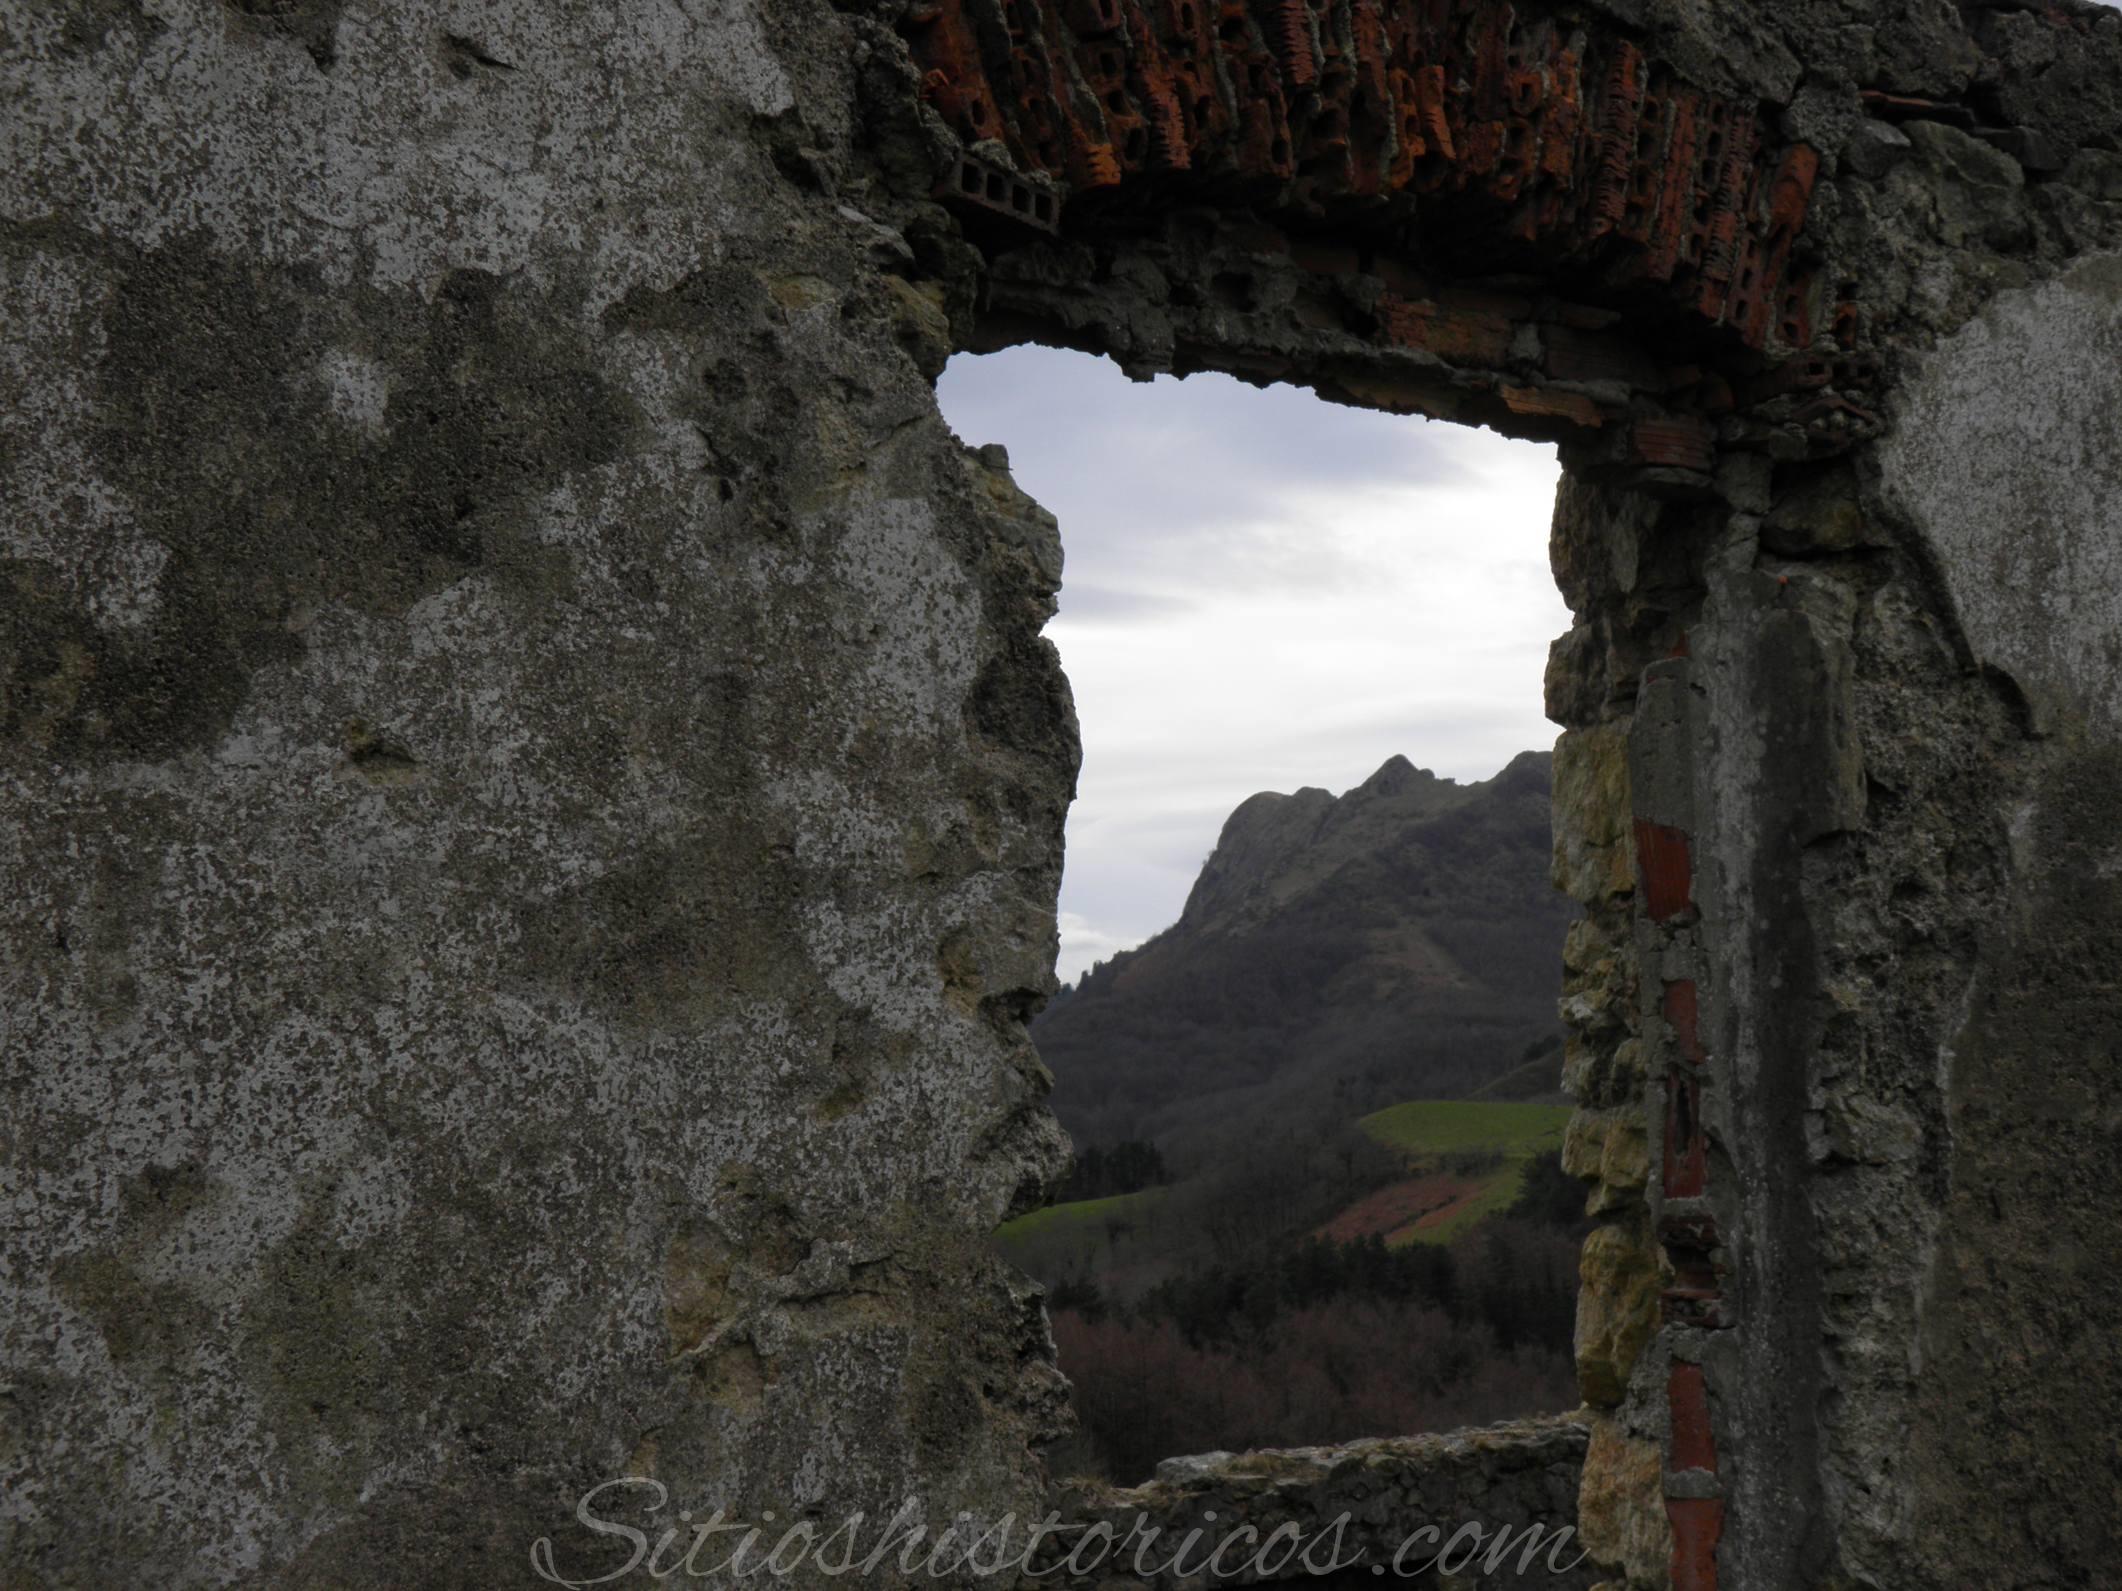 Sitios históricos fuerte Erlaitz